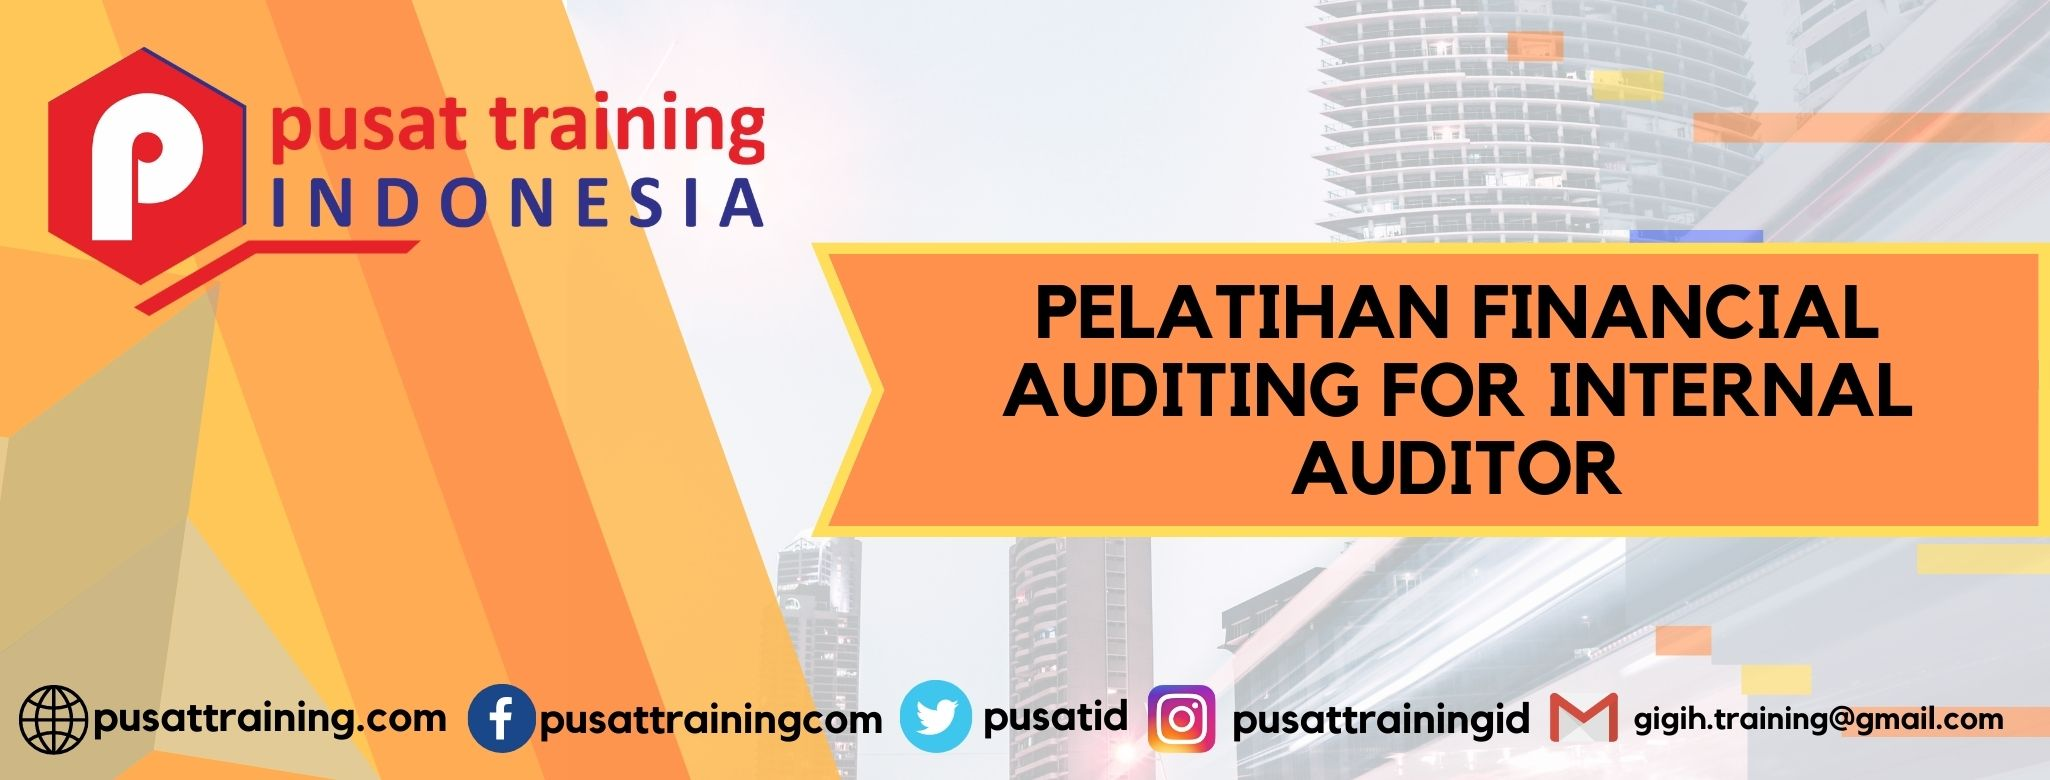 Pelatihan-financial-auditing-for-internal-auditor